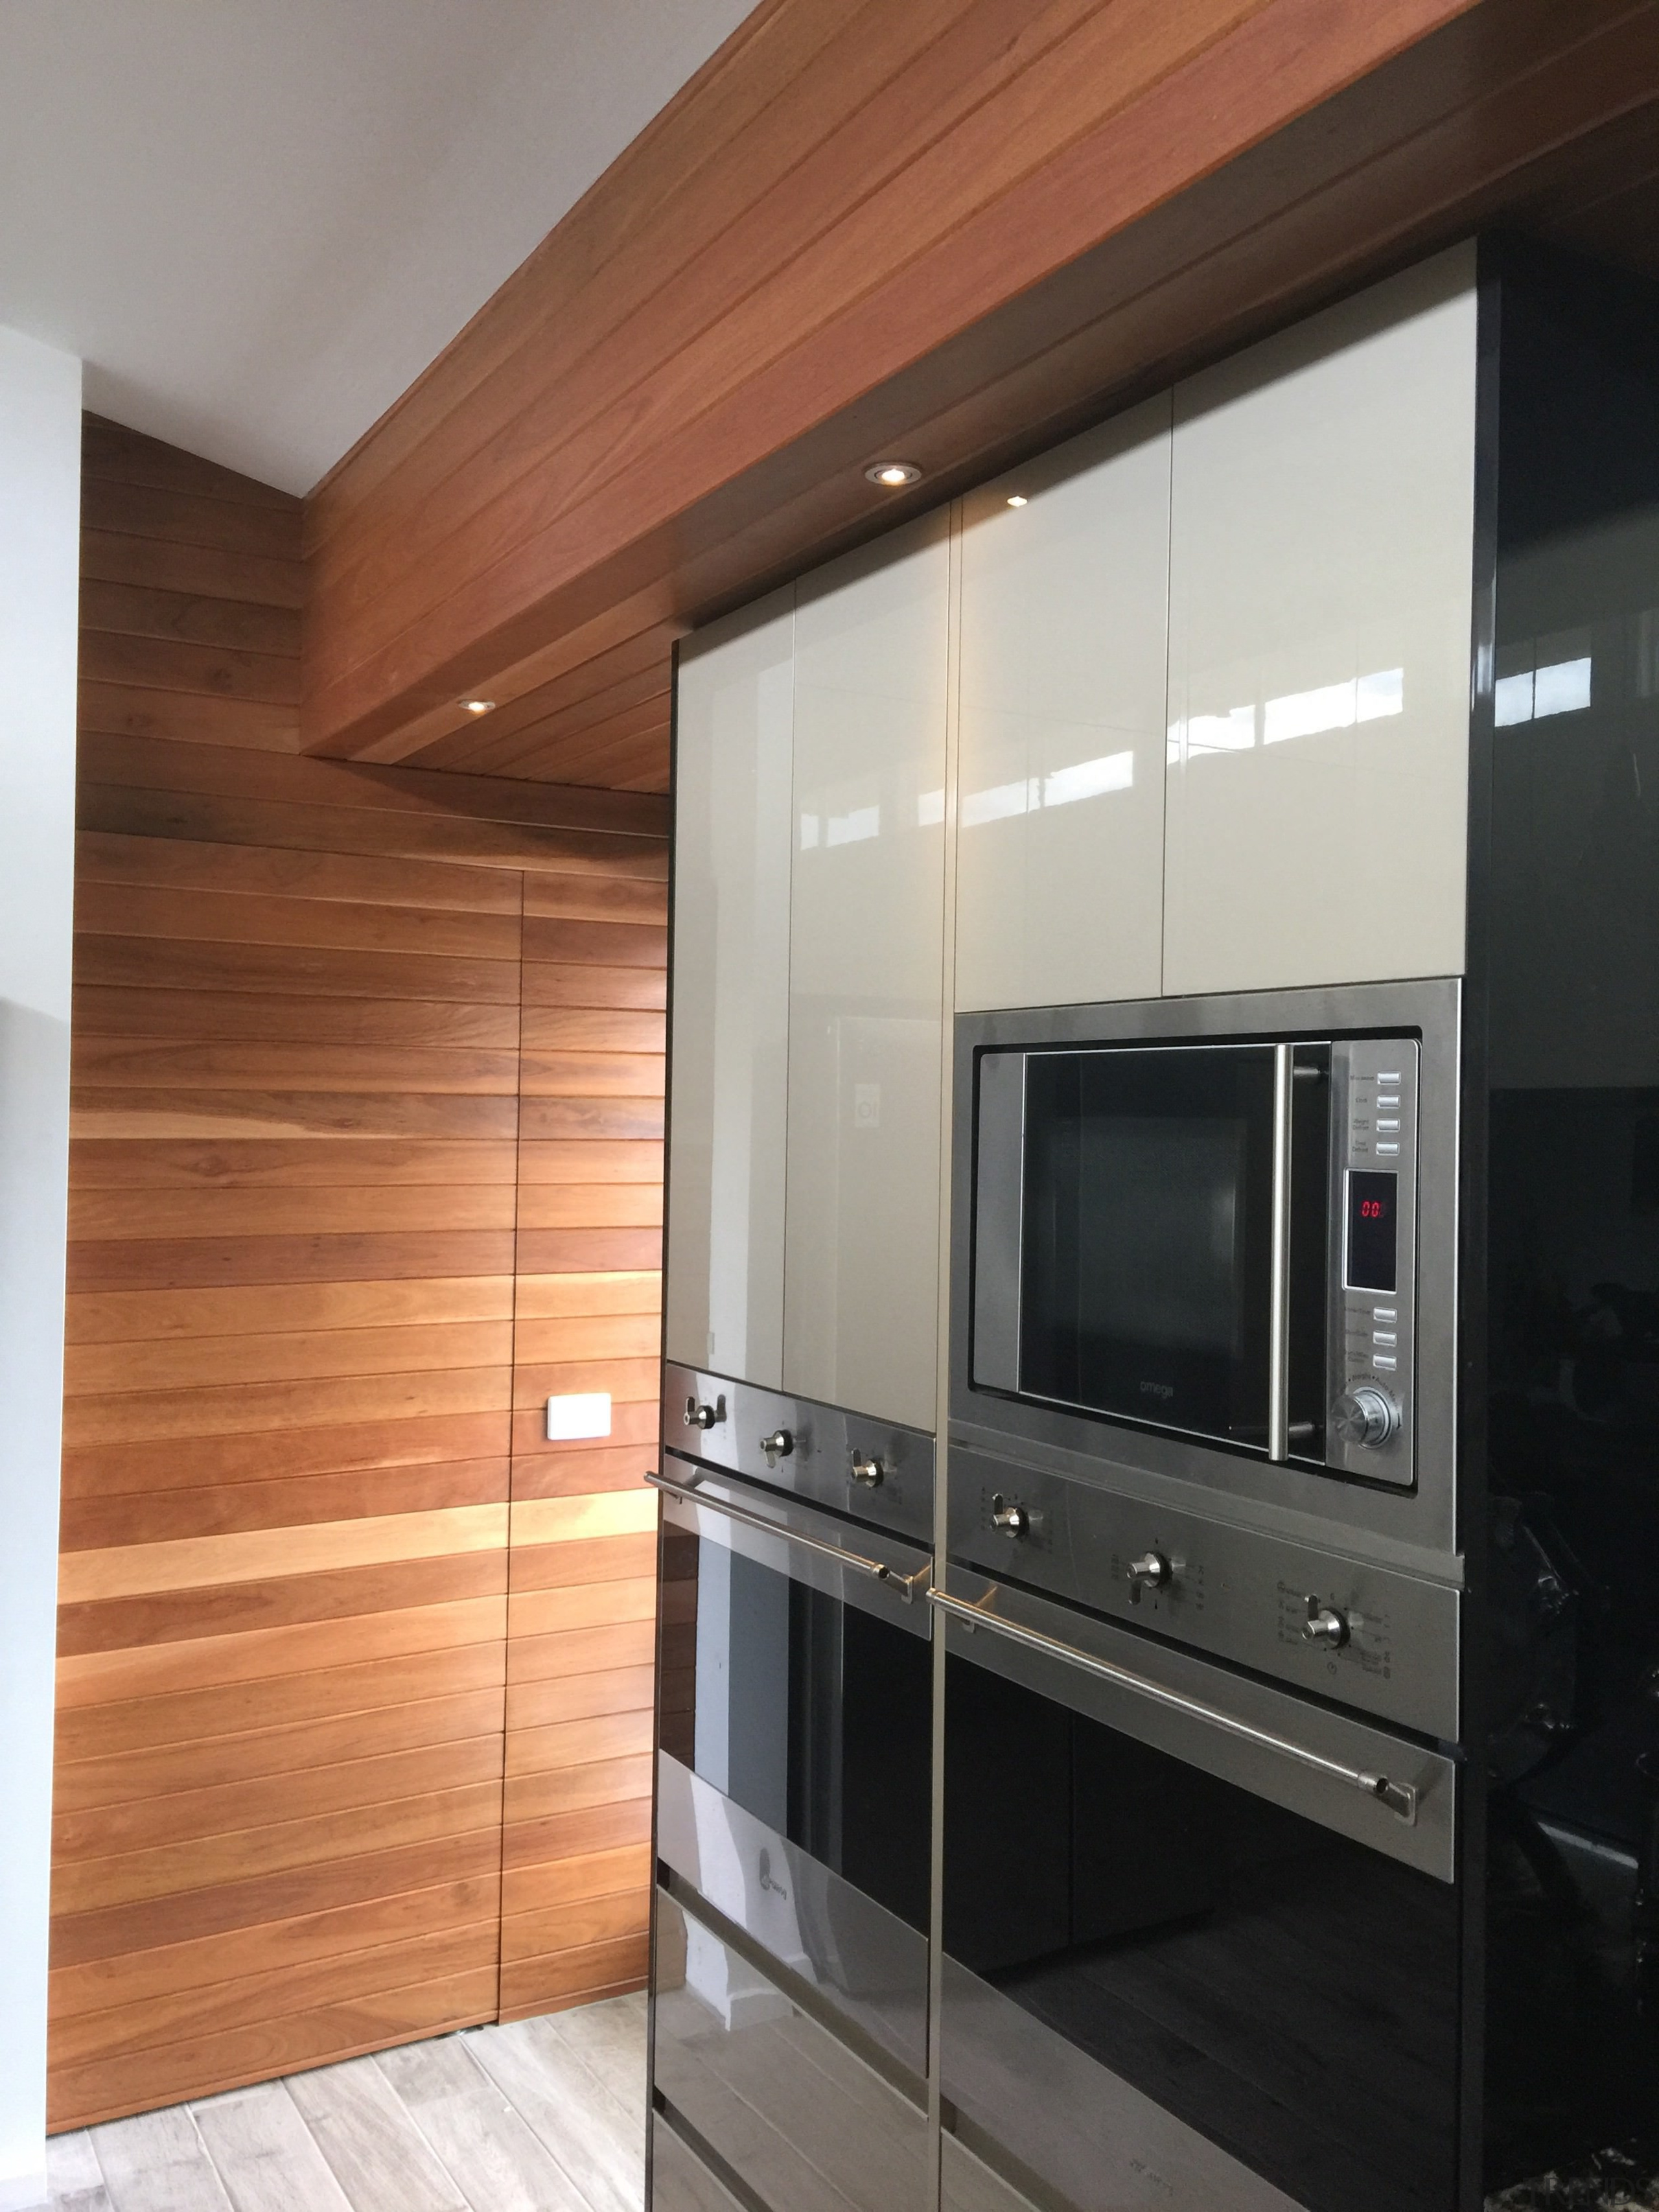 Centre Stage - Centre Stage - cabinetry   cabinetry, countertop, floor, flooring, home appliance, interior design, kitchen, major appliance, wood flooring, gray, brown